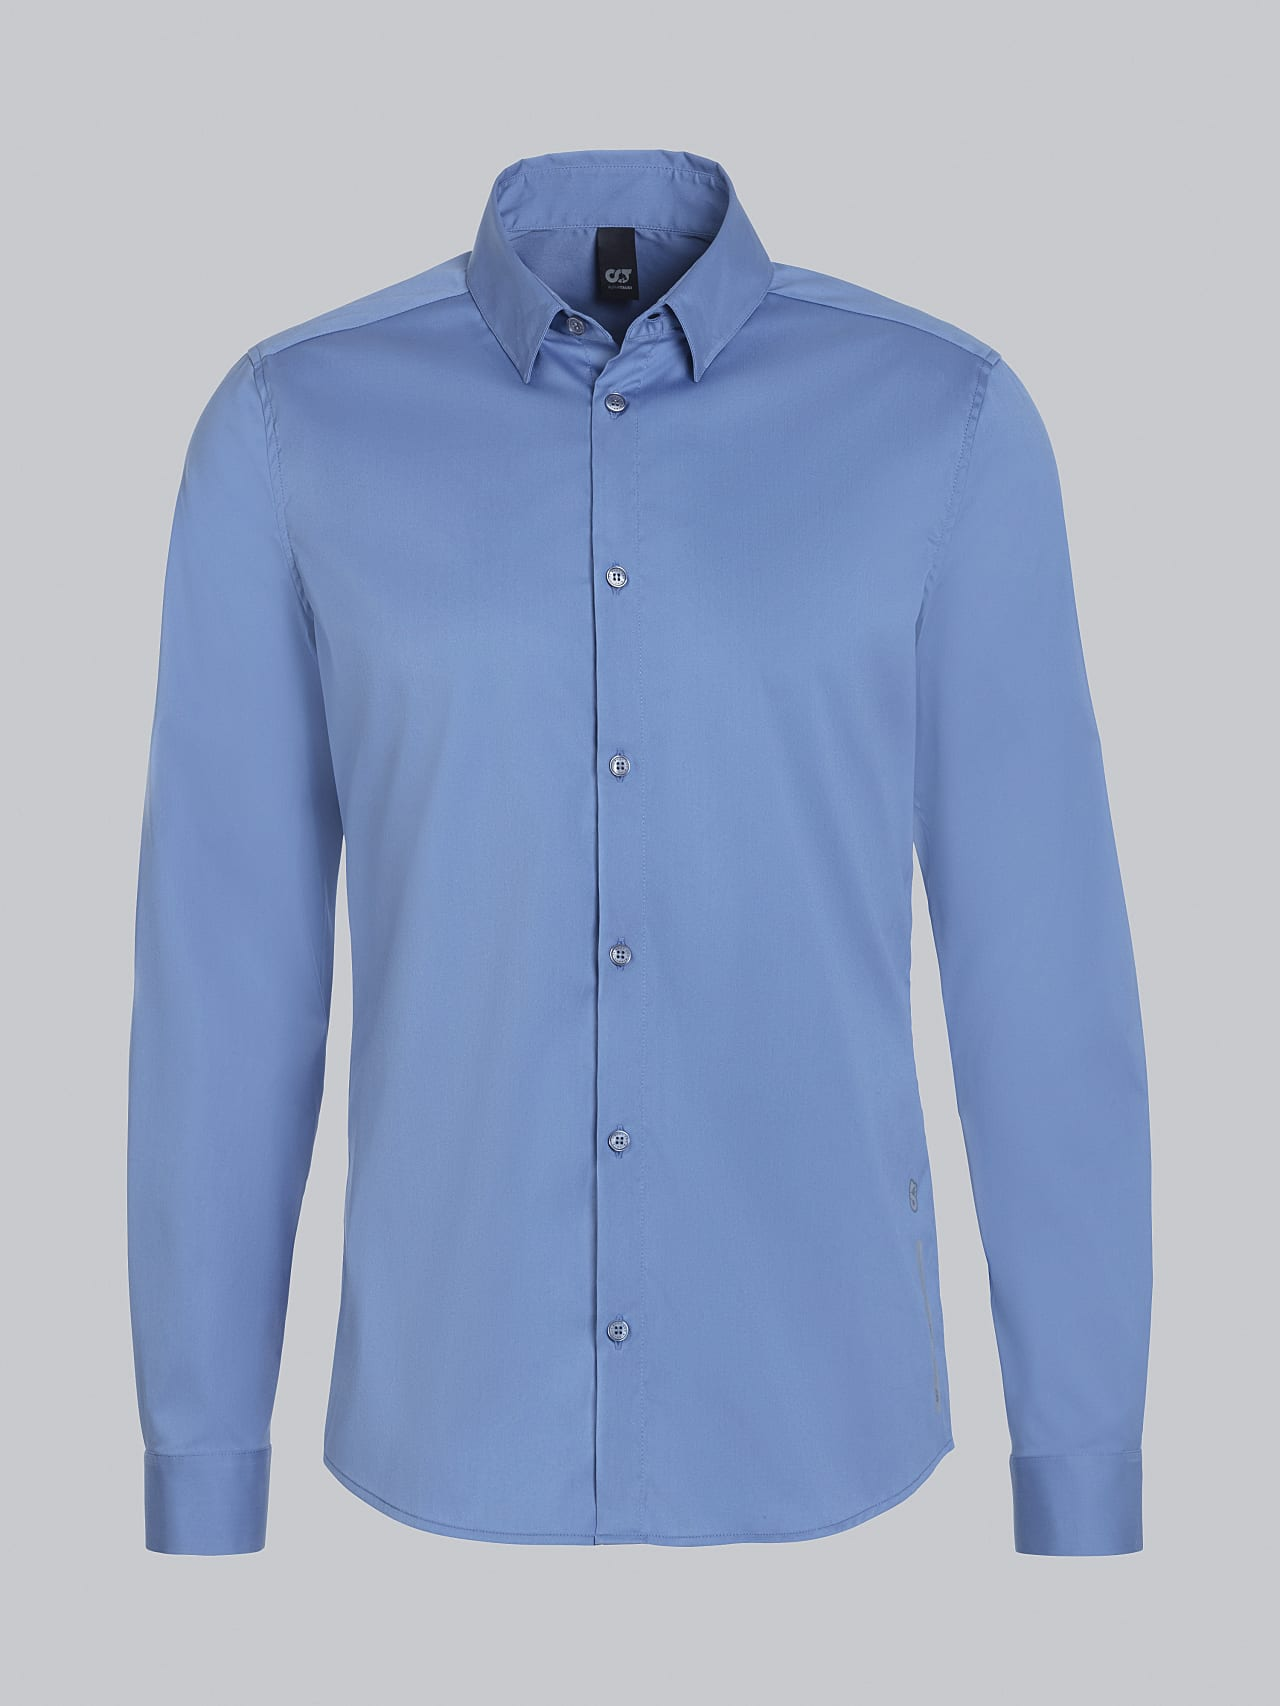 WAARG V2.Y5.02 Easy-Care Cotton Shirt light blue Back Alpha Tauri